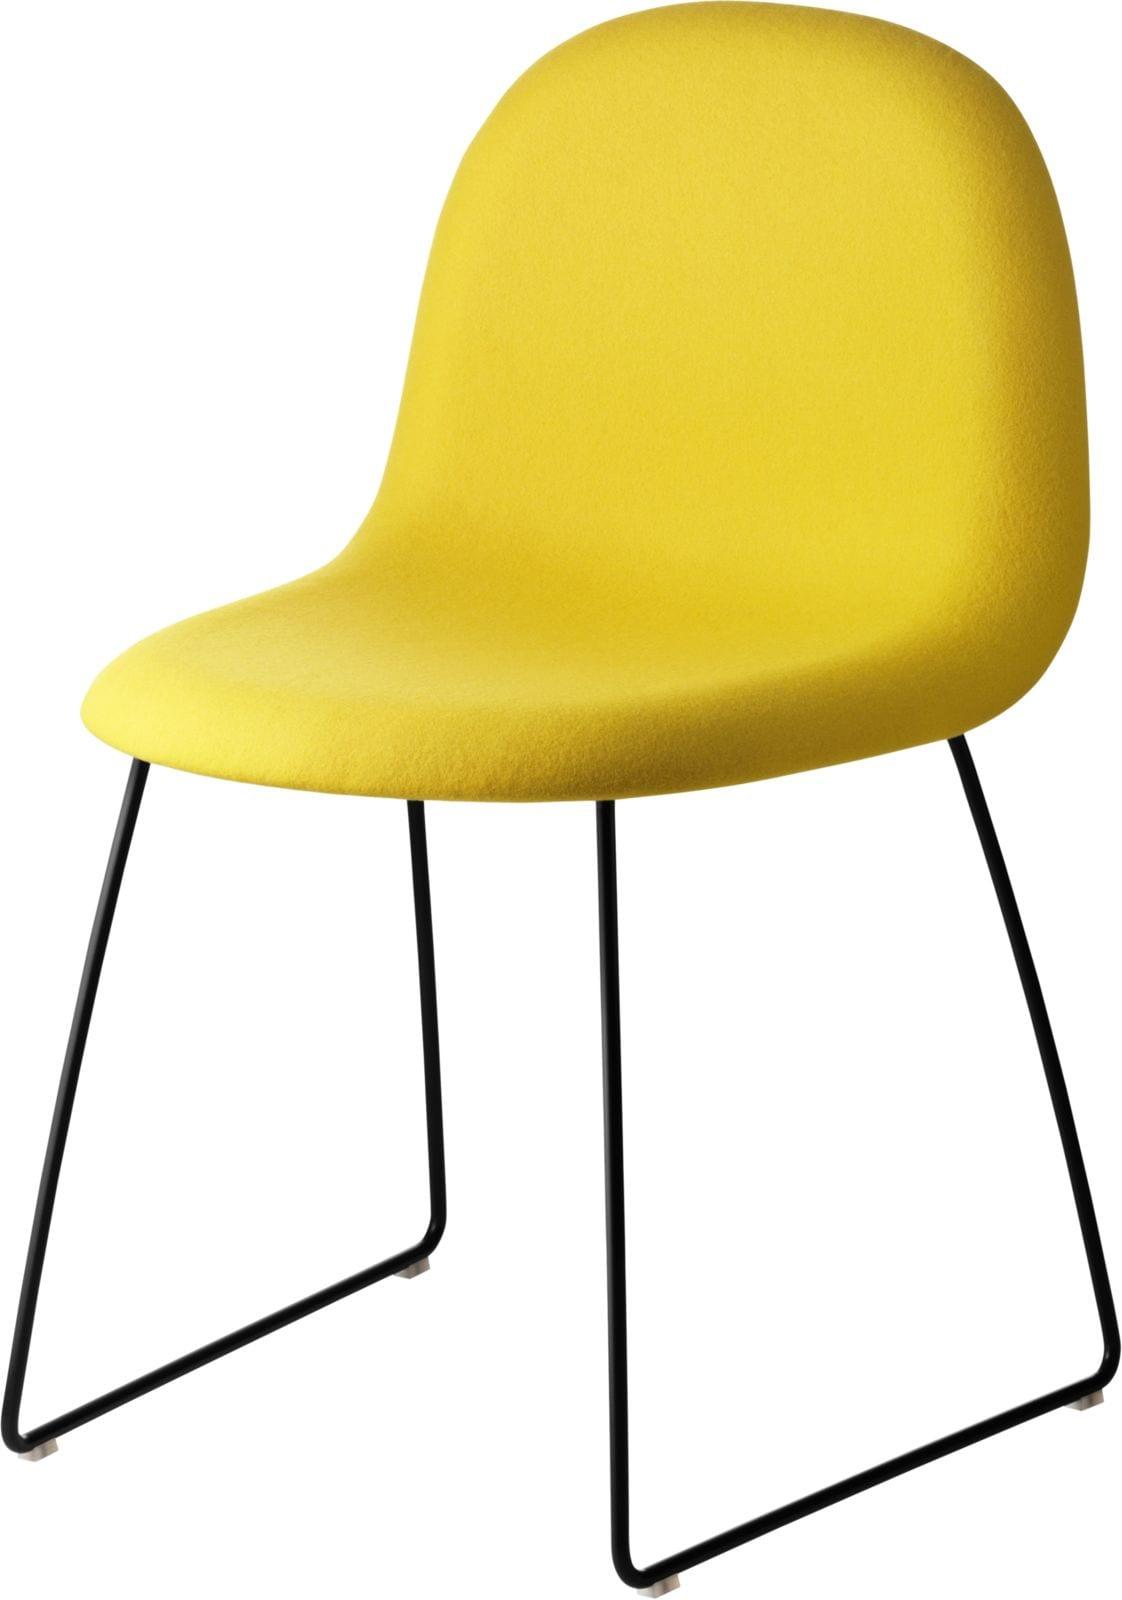 3D Dining Chair- Fully Upholstered, Sledge Base